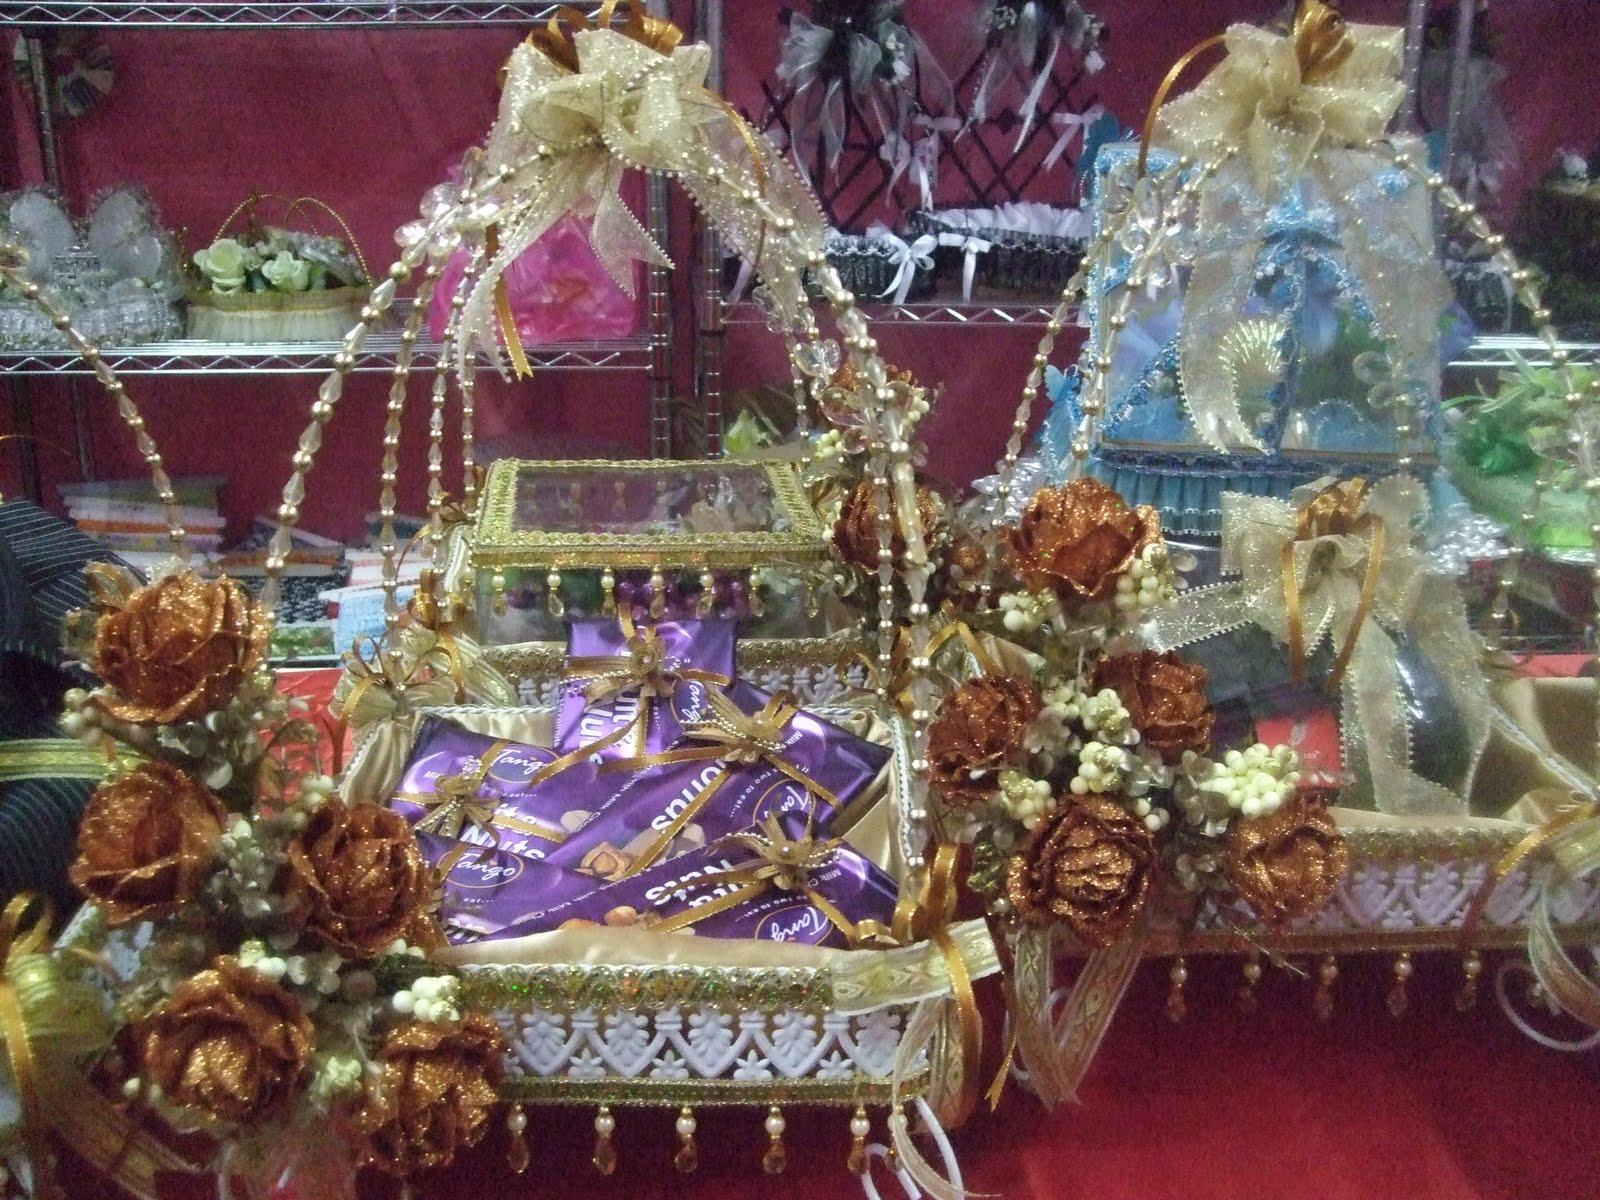 SEWA BEKAS HANTARAN TEMA WARNA GOLD | CITARASA MODEN